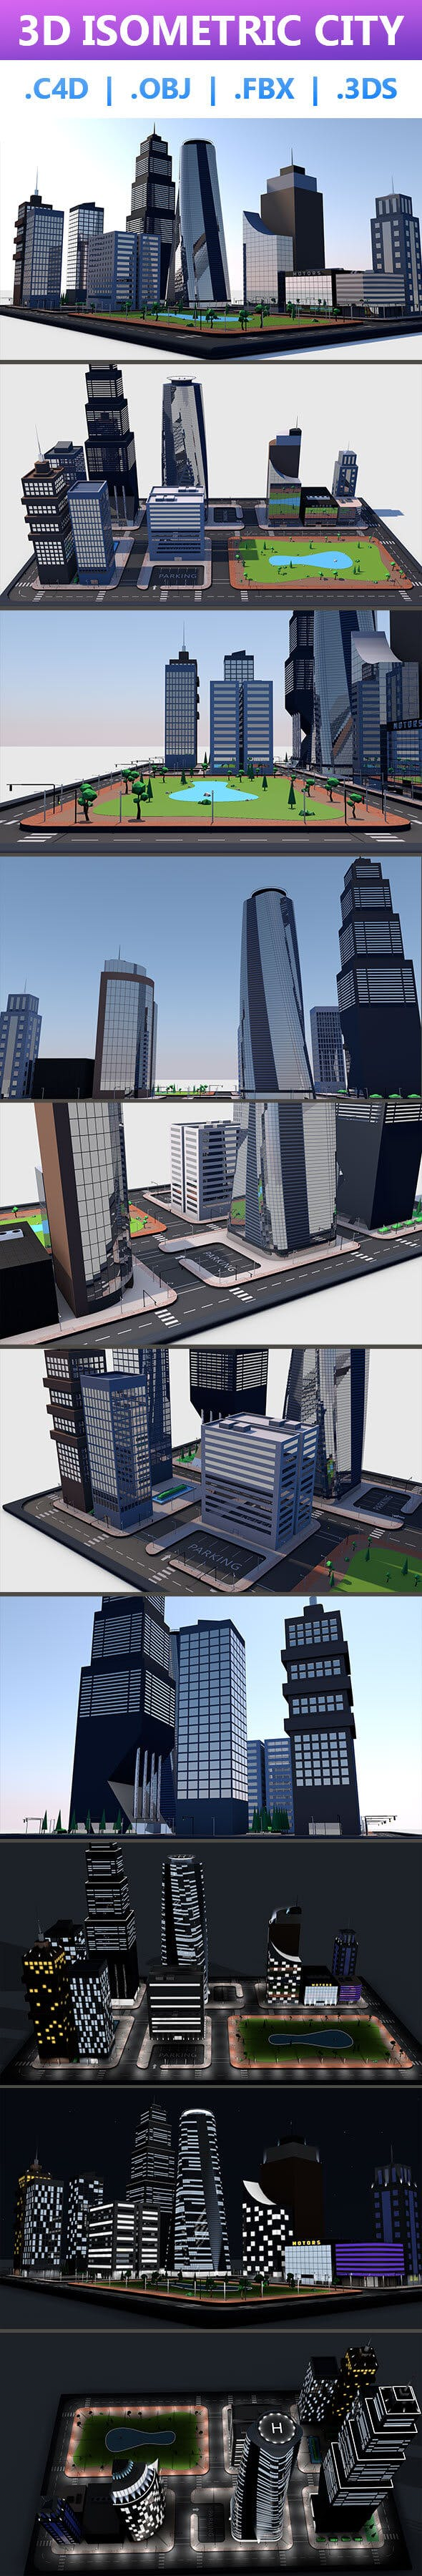 3D Isometric City - 3DOcean Item for Sale